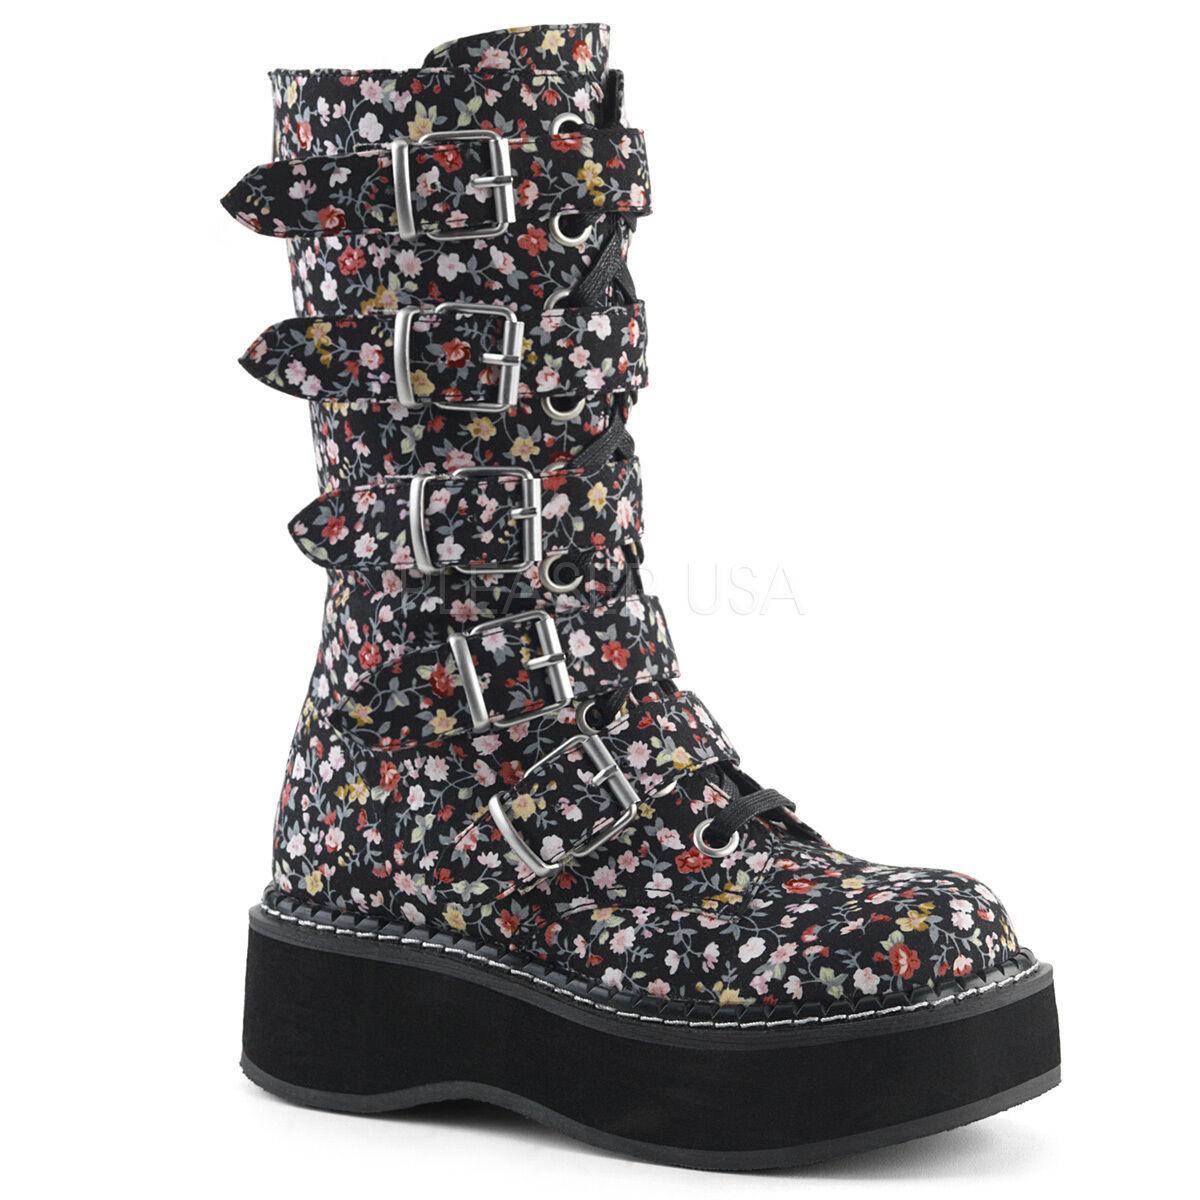 Demonia 2  Platform colorful Floral Flower 5-Buckle Strap Calf Boots 6-12